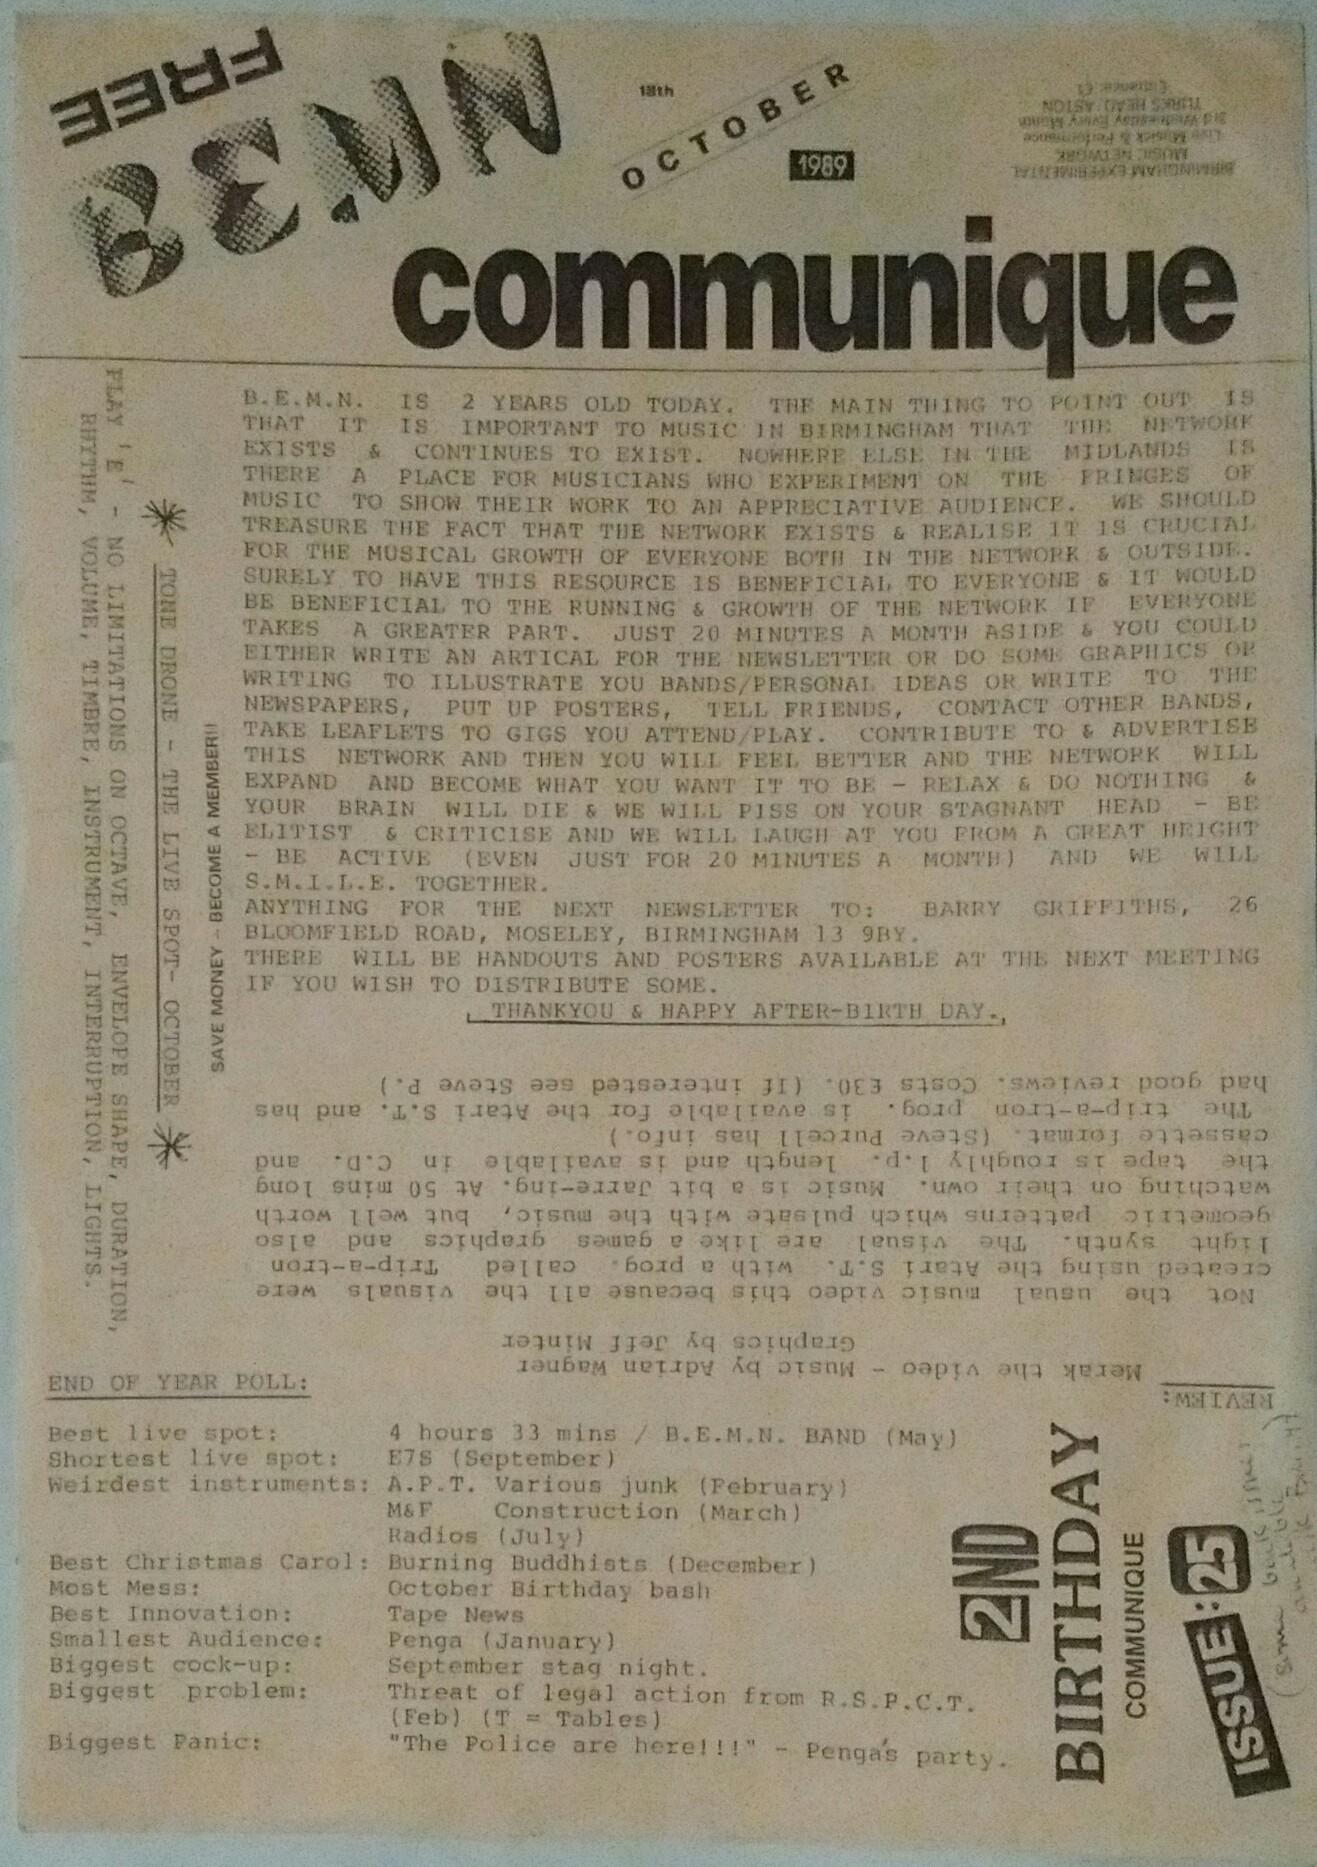 BEMN_October 89 Communique